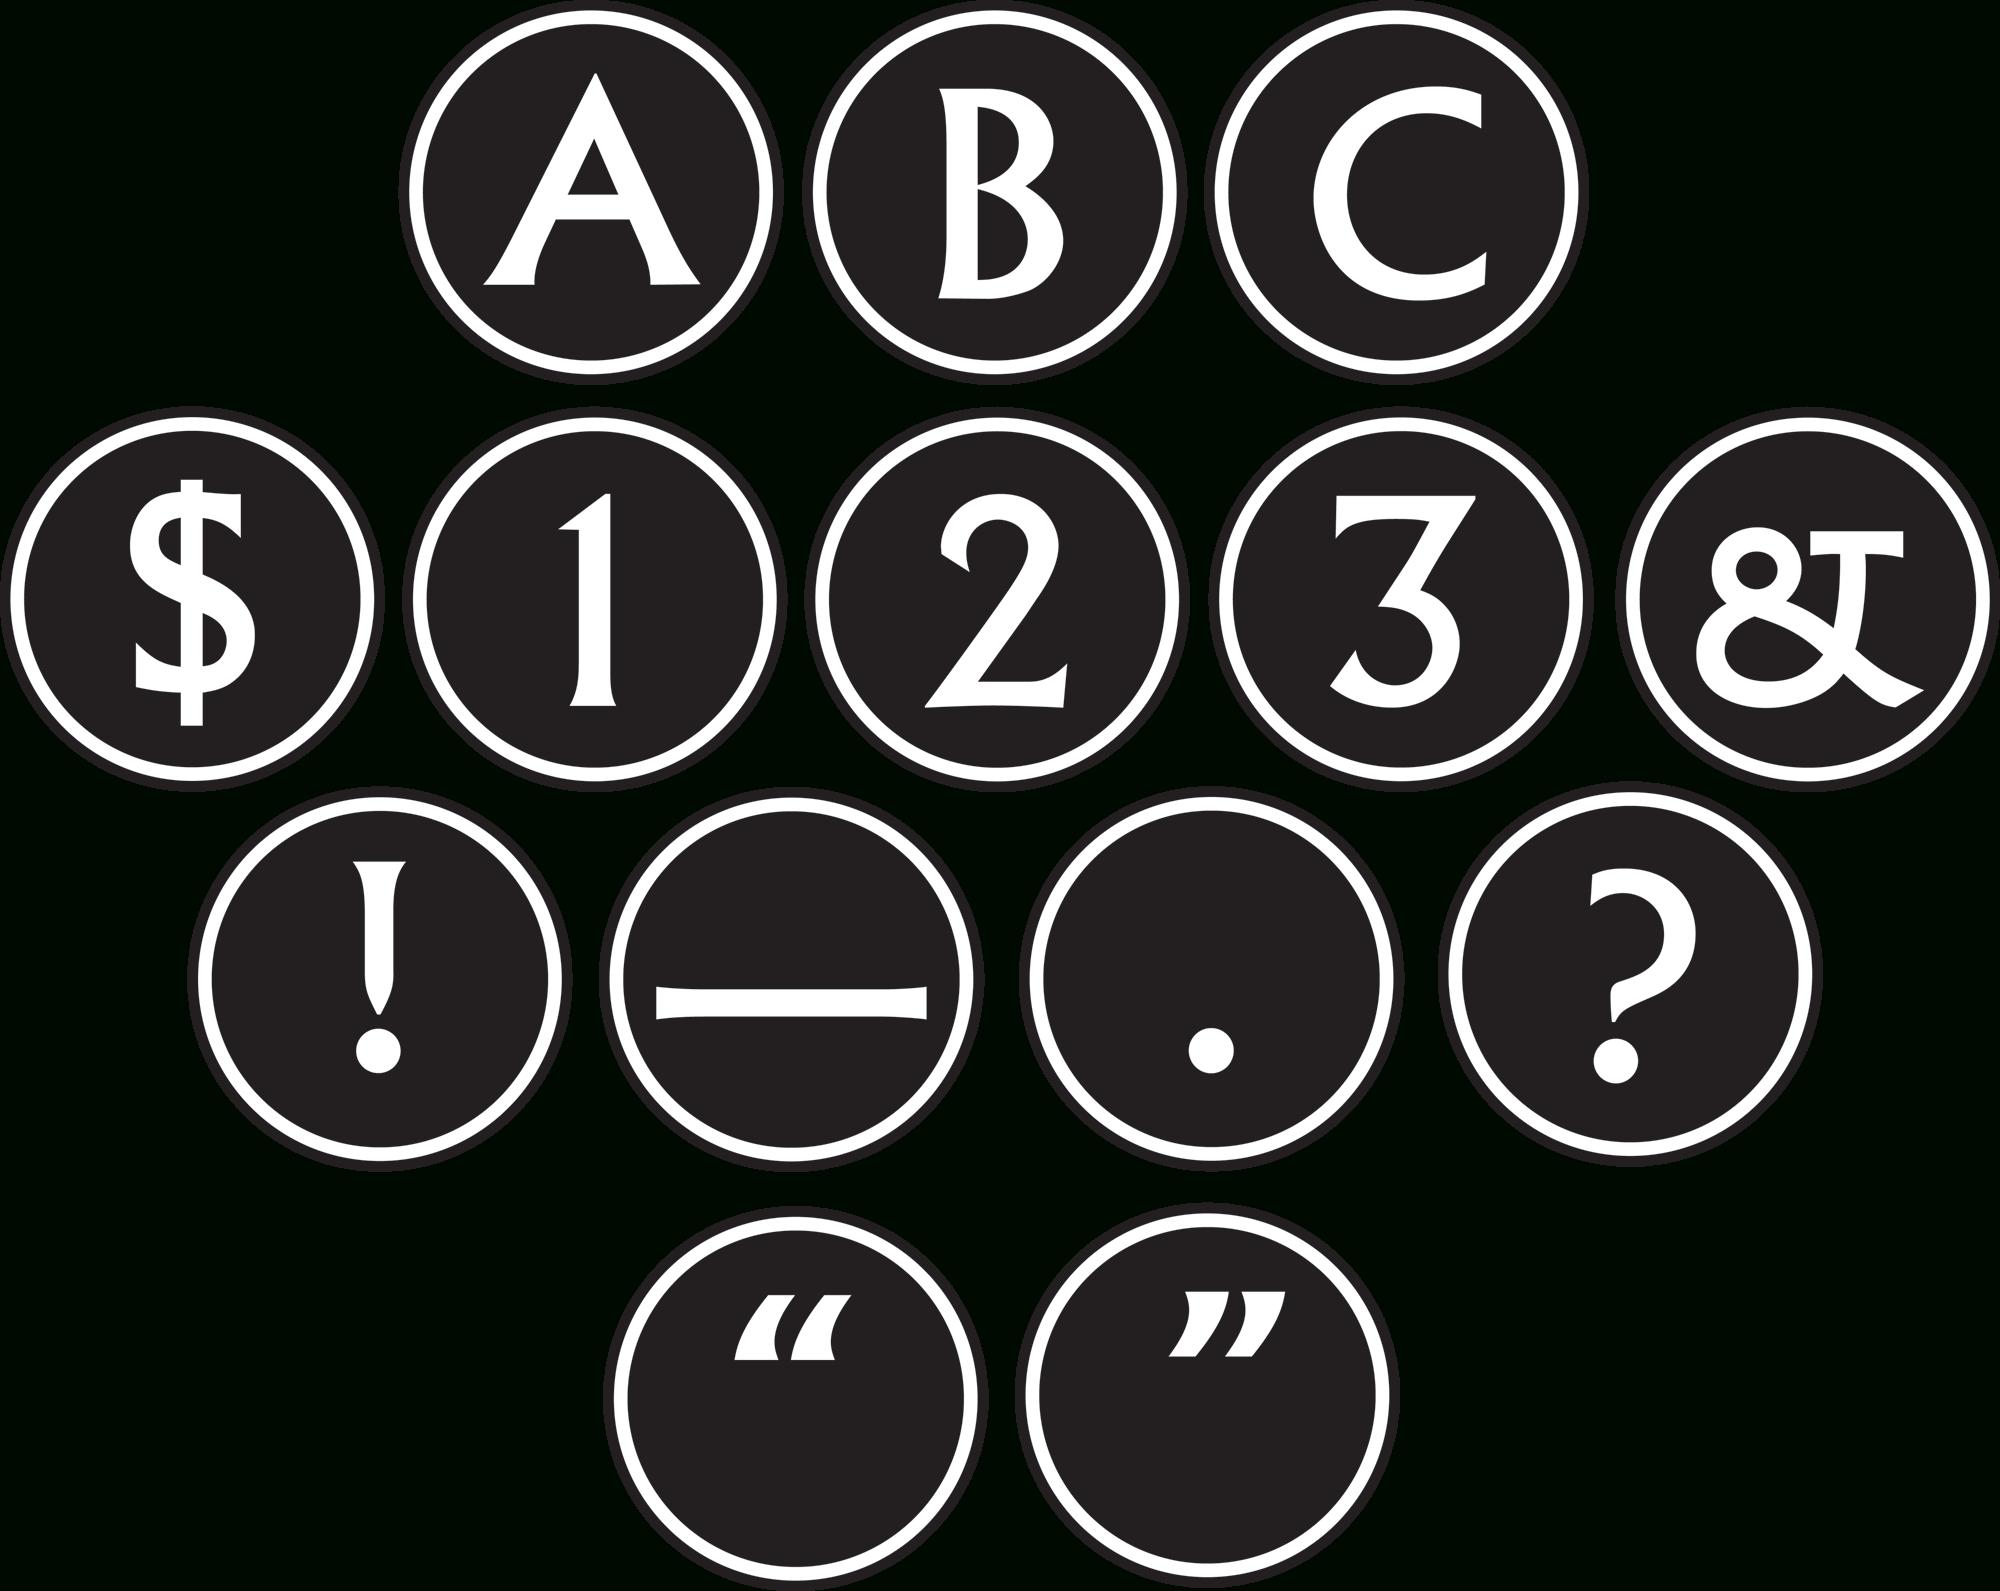 Big Bold Black White Circle Letters TCR75400 Teacher